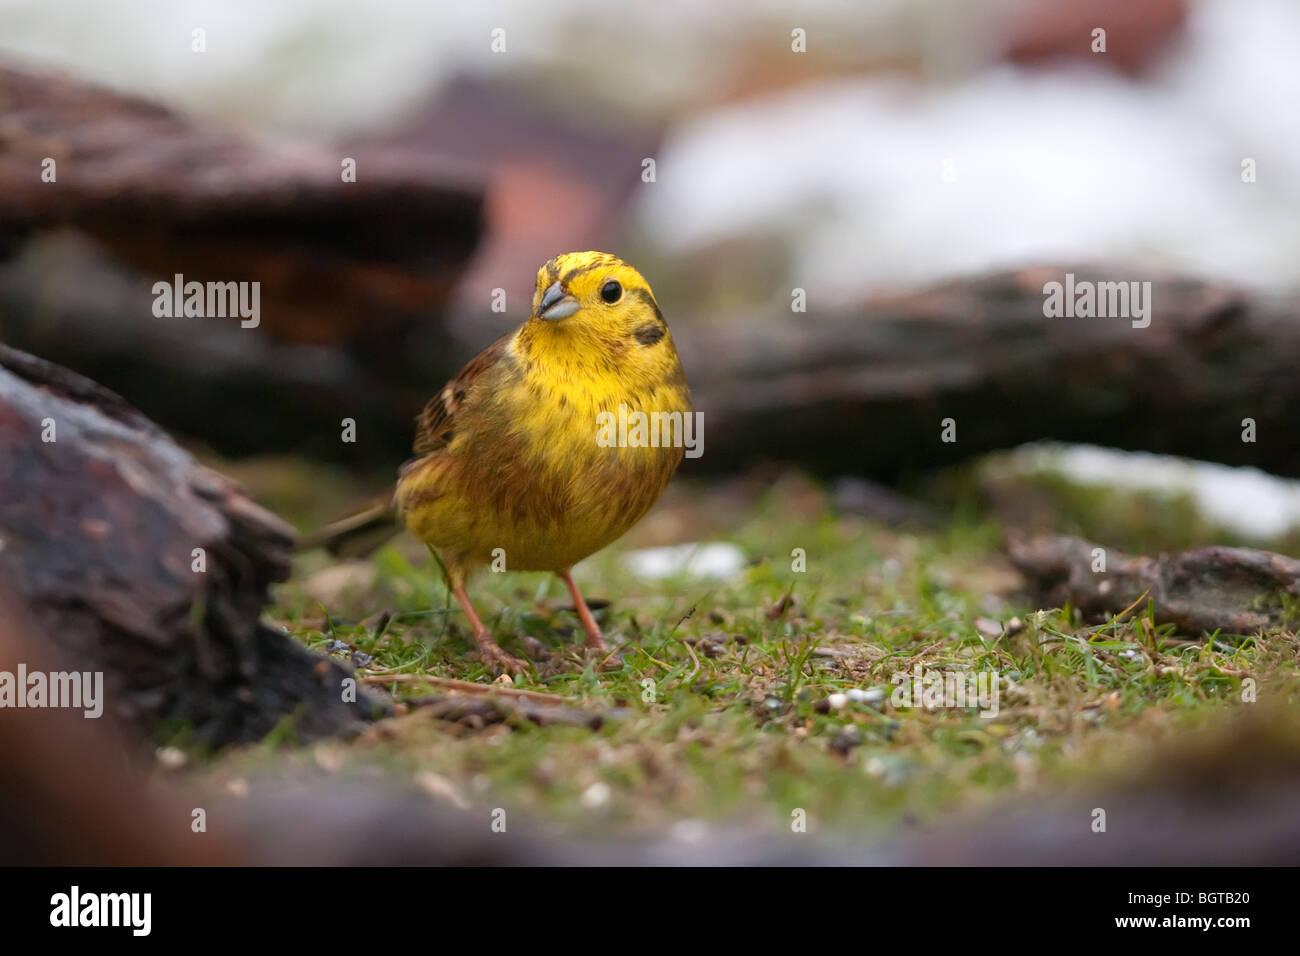 Male Yellowhammer - Stock Image